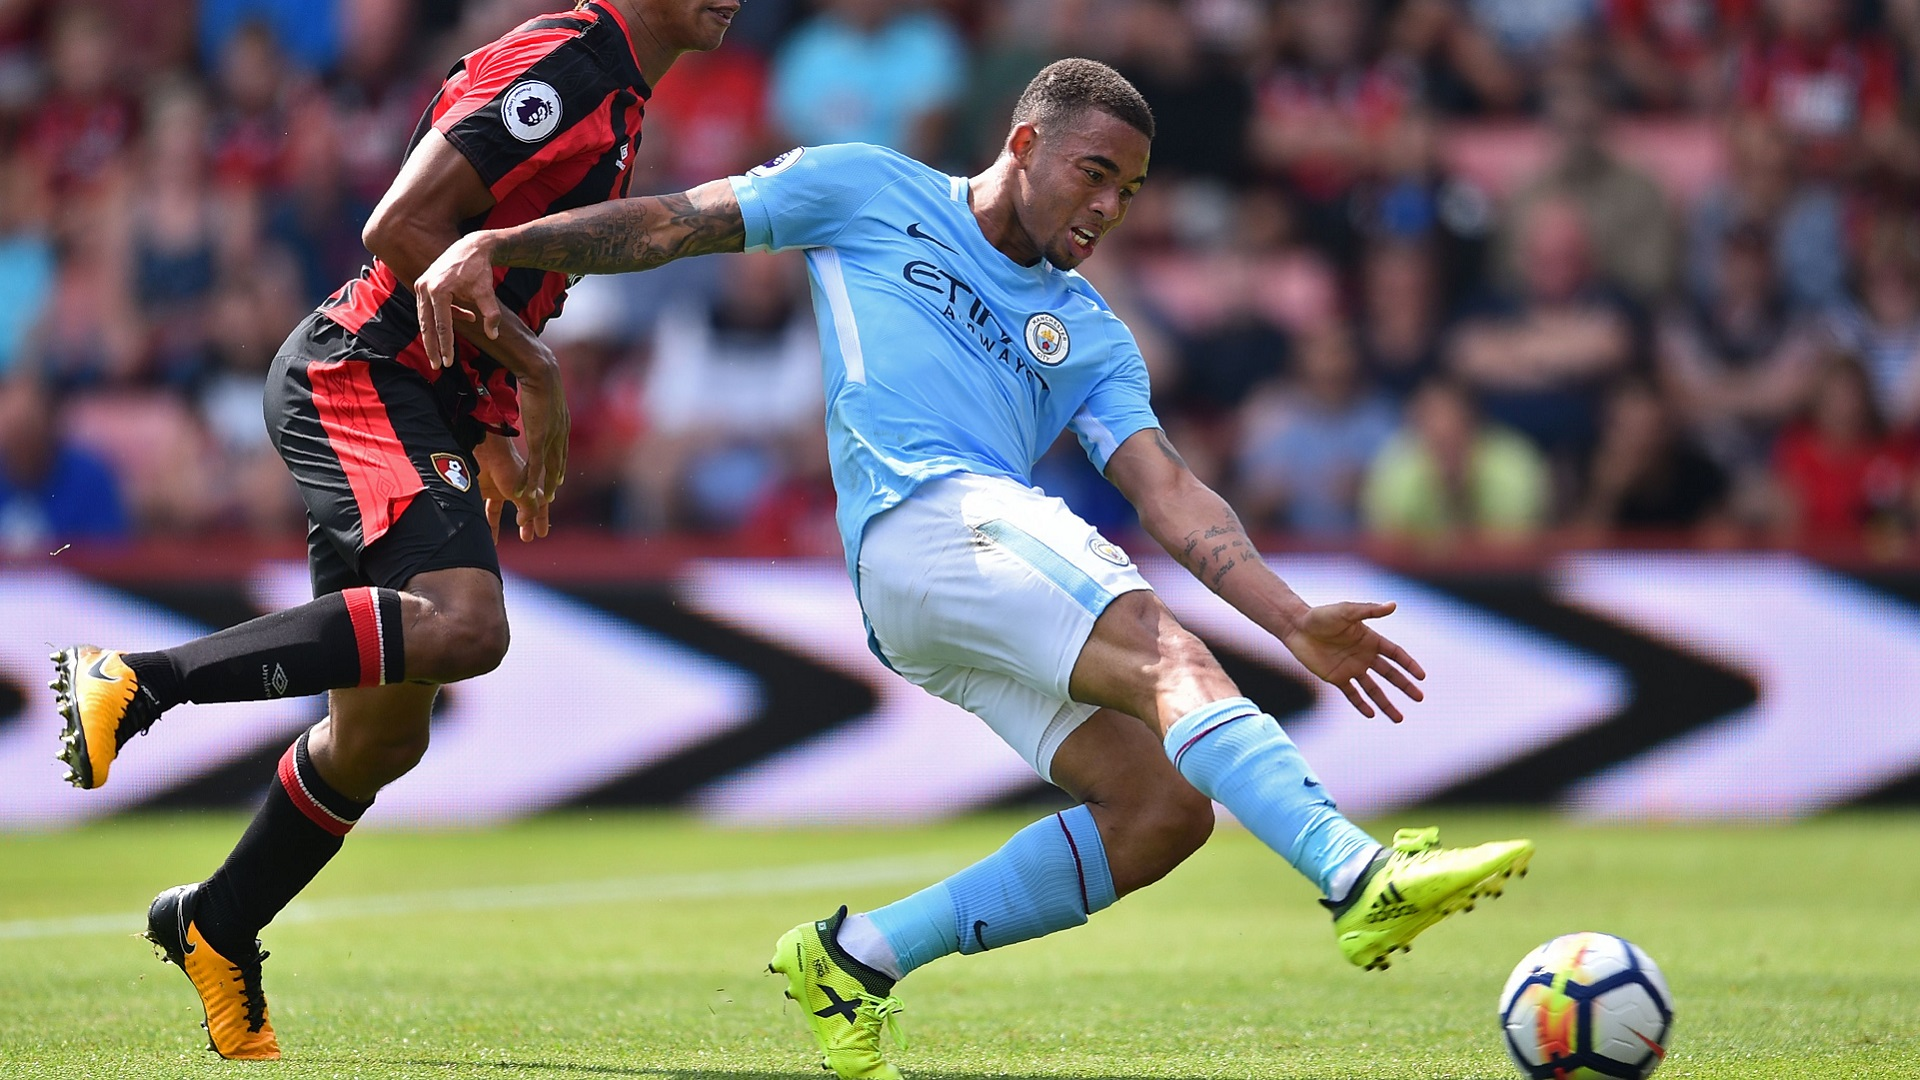 2017-08-26 Jesus Manchester City